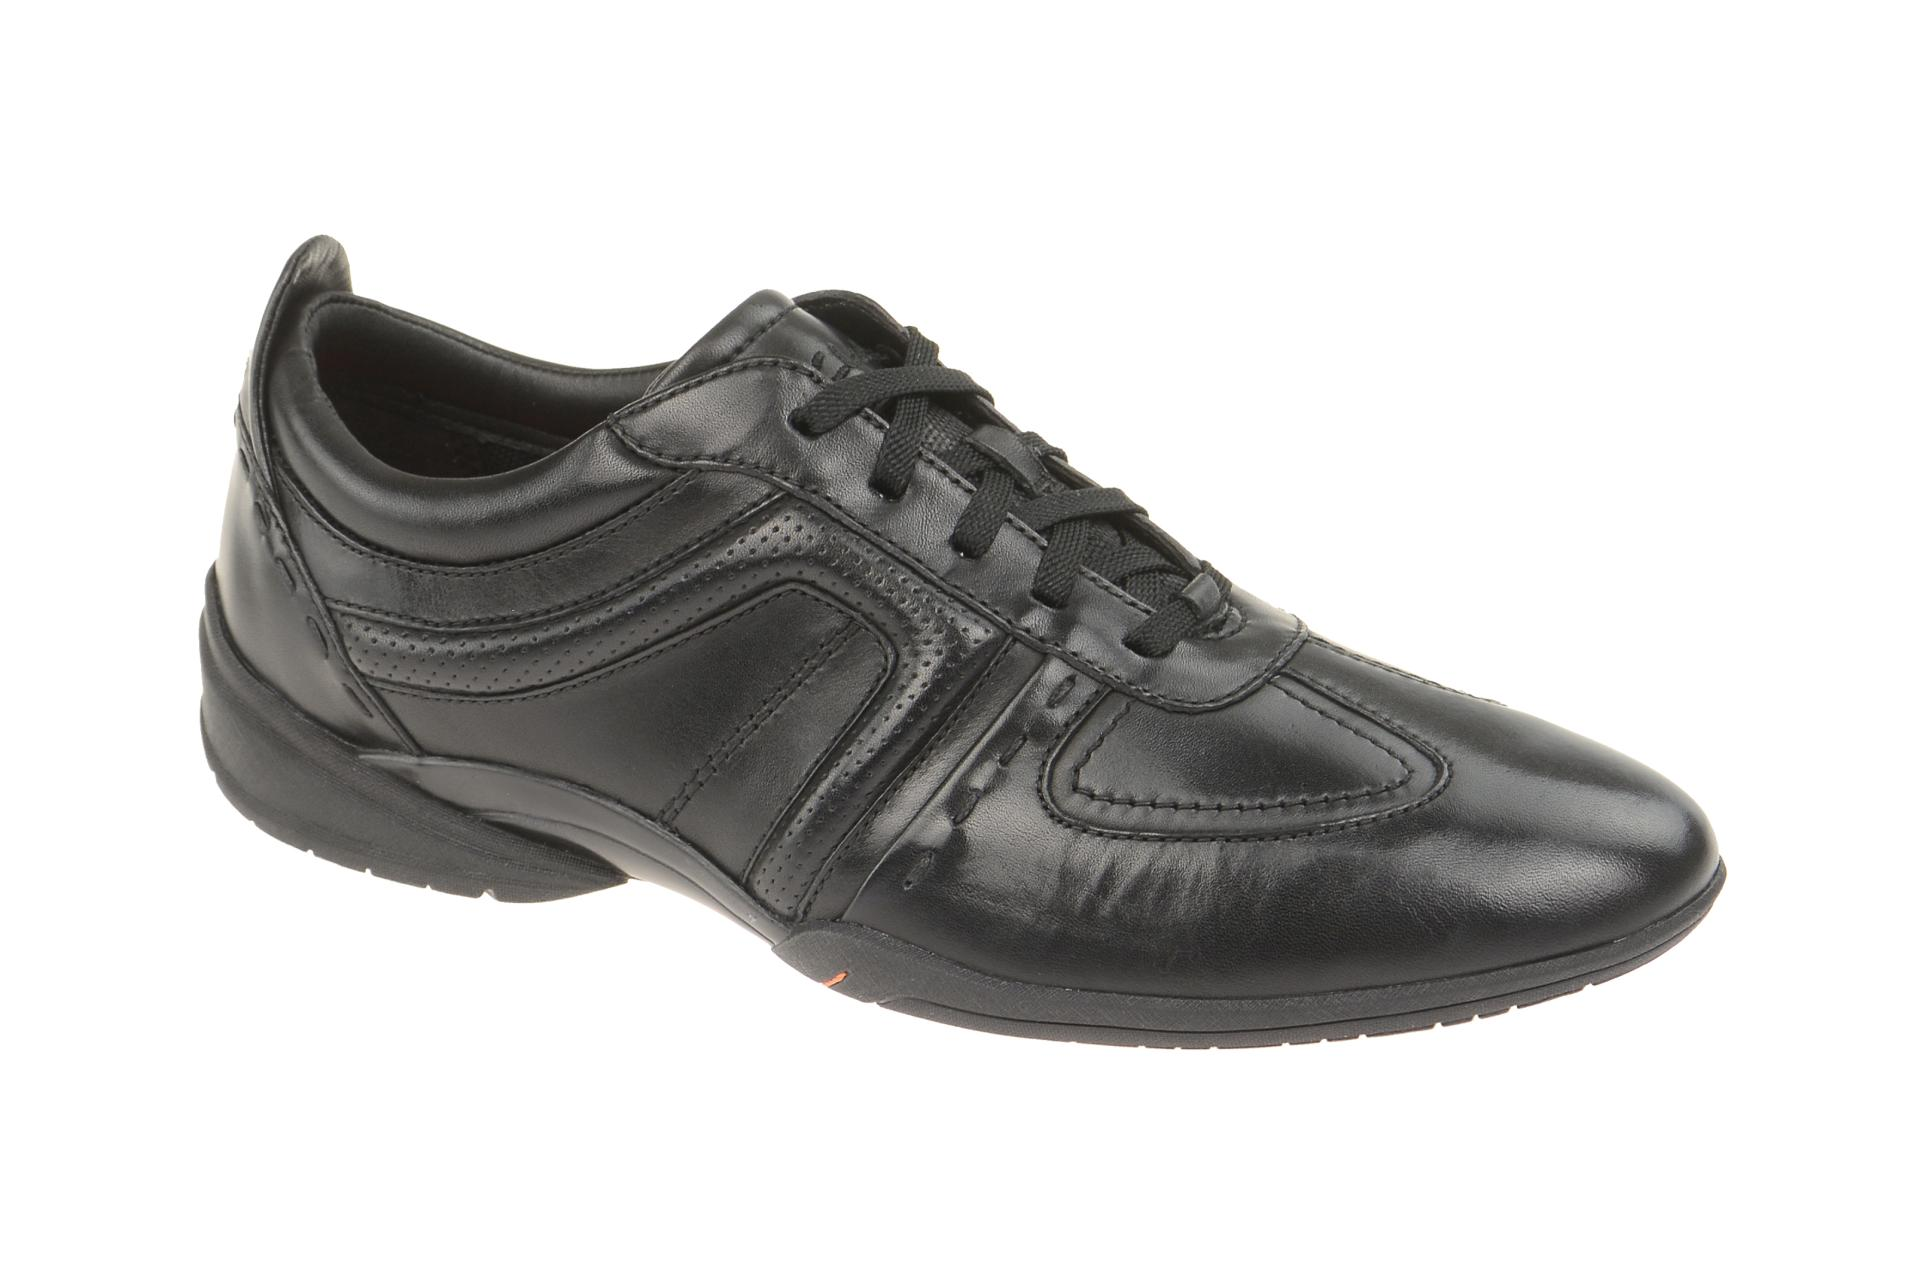 detailed pictures sports shoes price reduced Clarks FLUX SPRING Schuhe schwarz Schnürer NEU on PopScreen